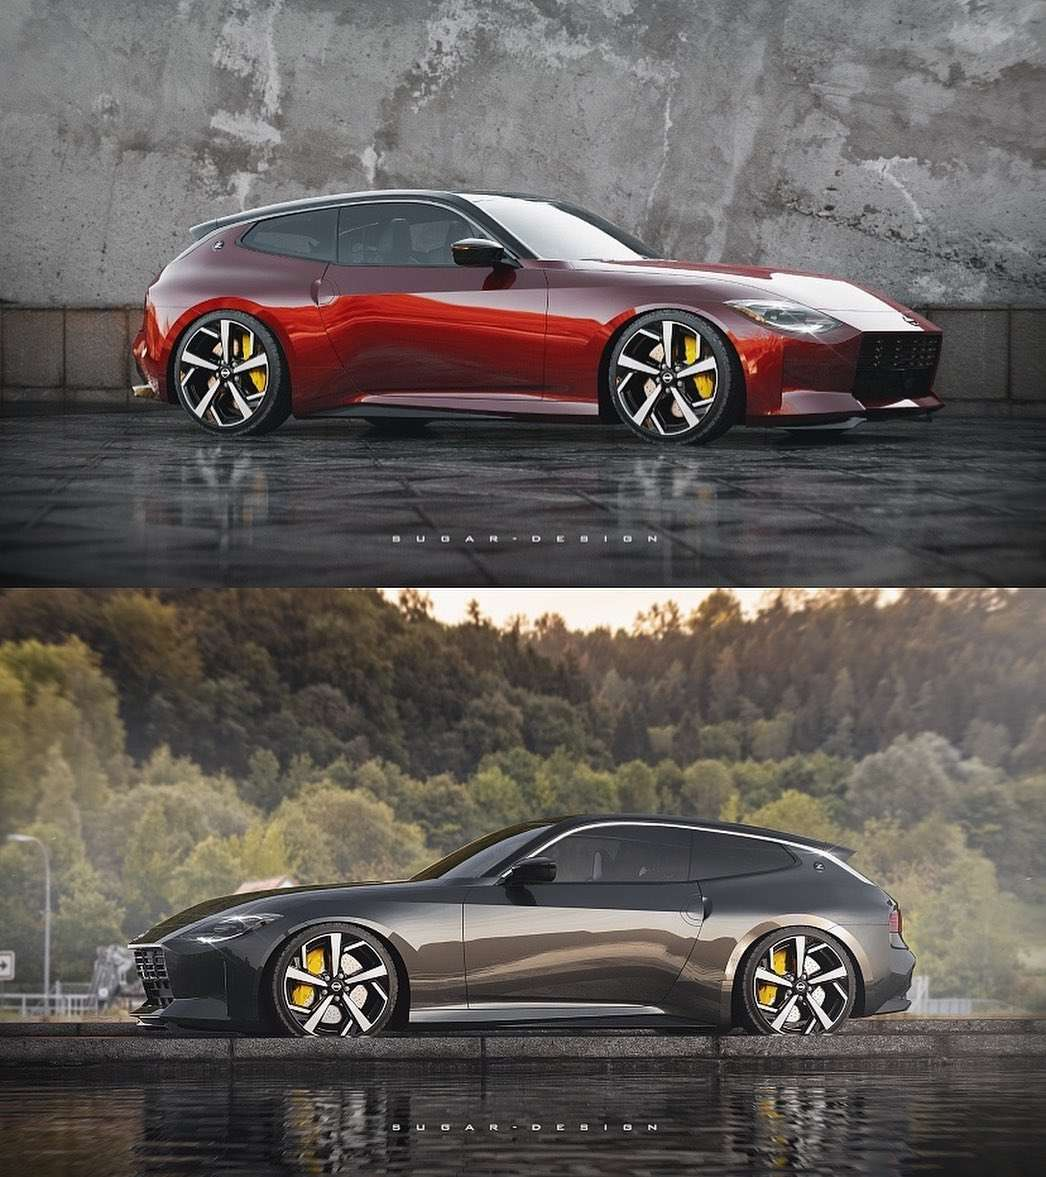 nissan-fairlady-400z-hatchback-rendering-looks-like-an-improved-z-car-163013_1.jpg